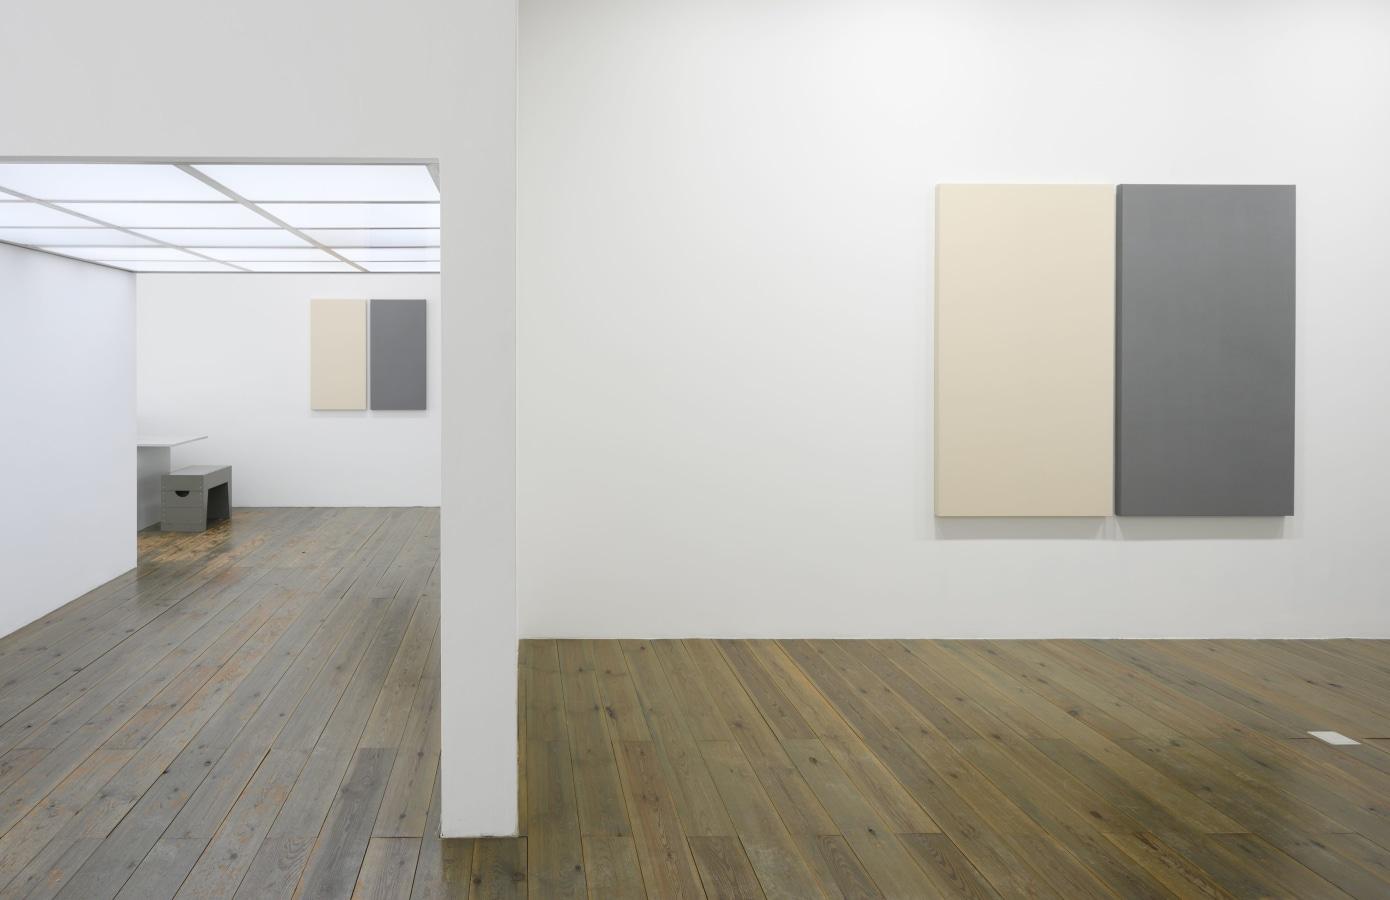 Painted / Unpainted - Alan Charlton, Alan Charlton,